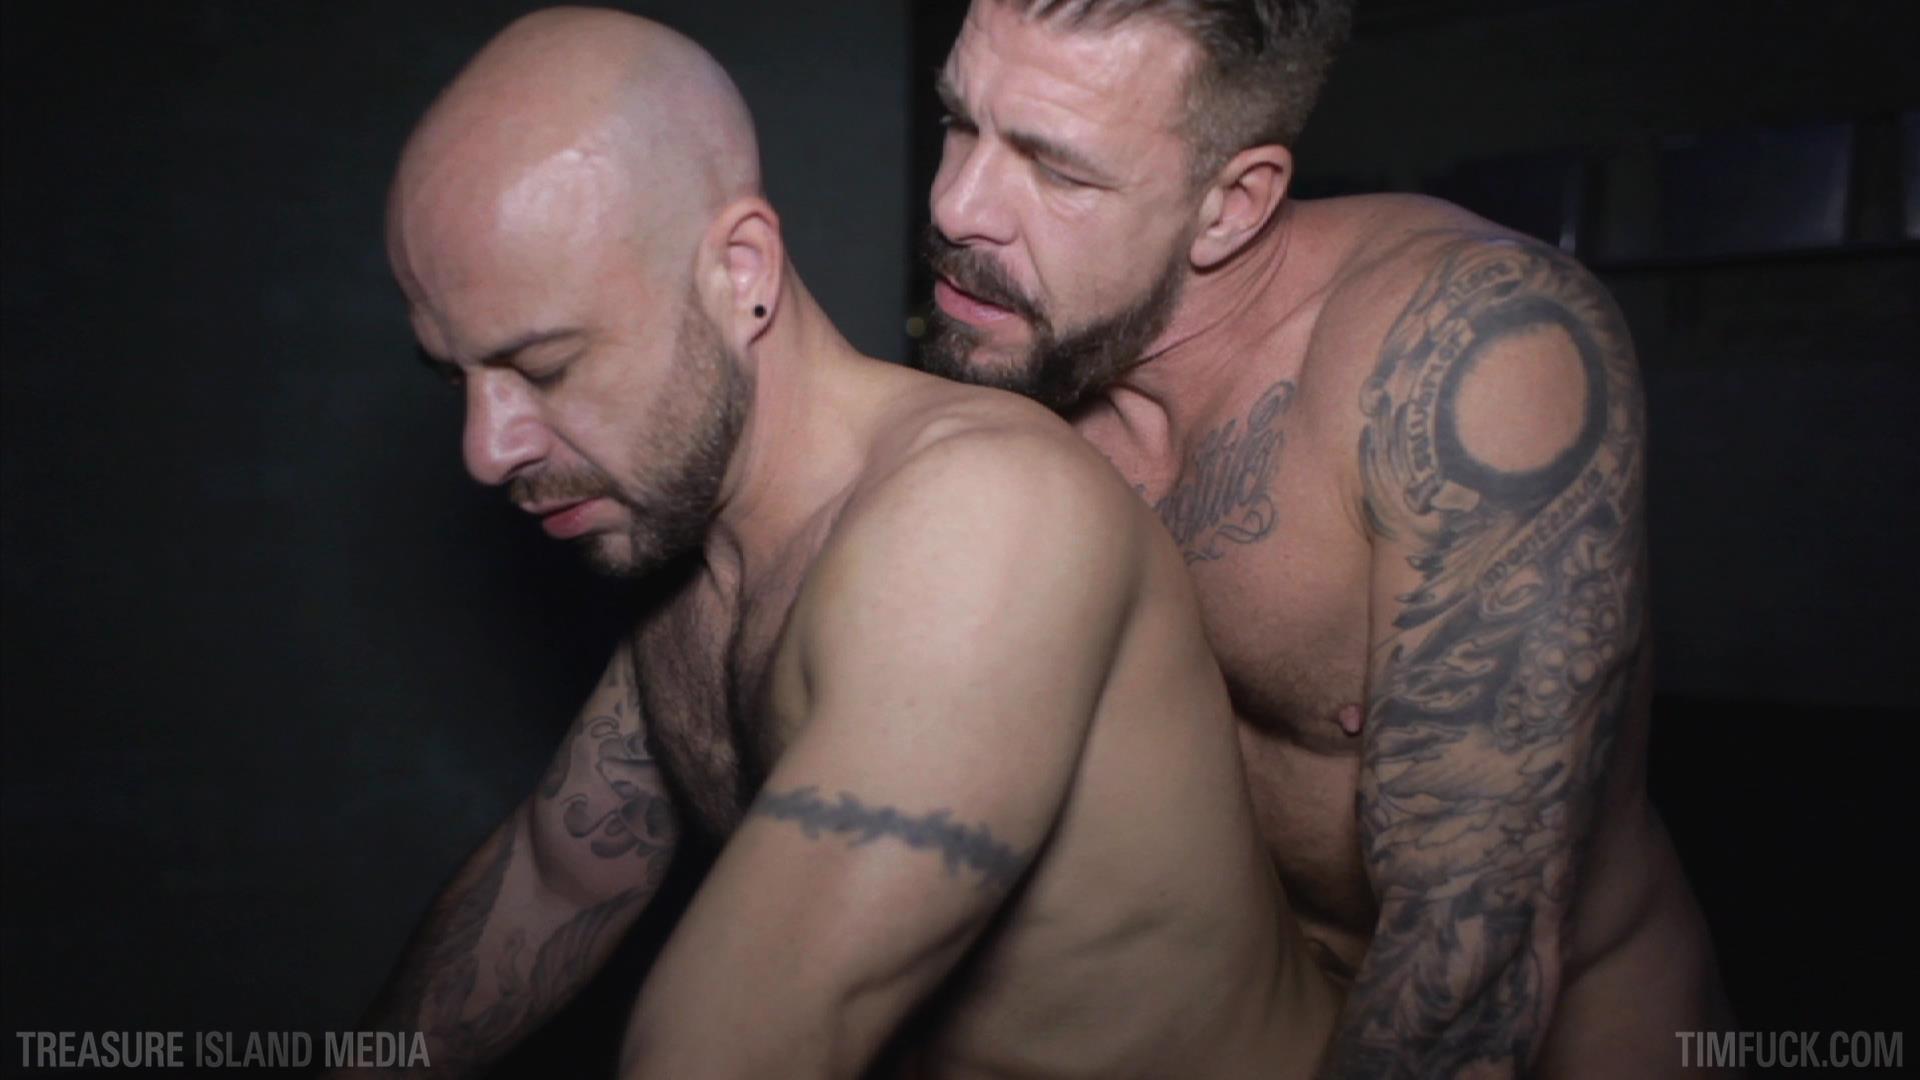 Treasure-Island-Media-TimFuck-Rocco-Steele-and-Ben-Statham-Bareback-Amateur-Gay-Porn-01.jpg